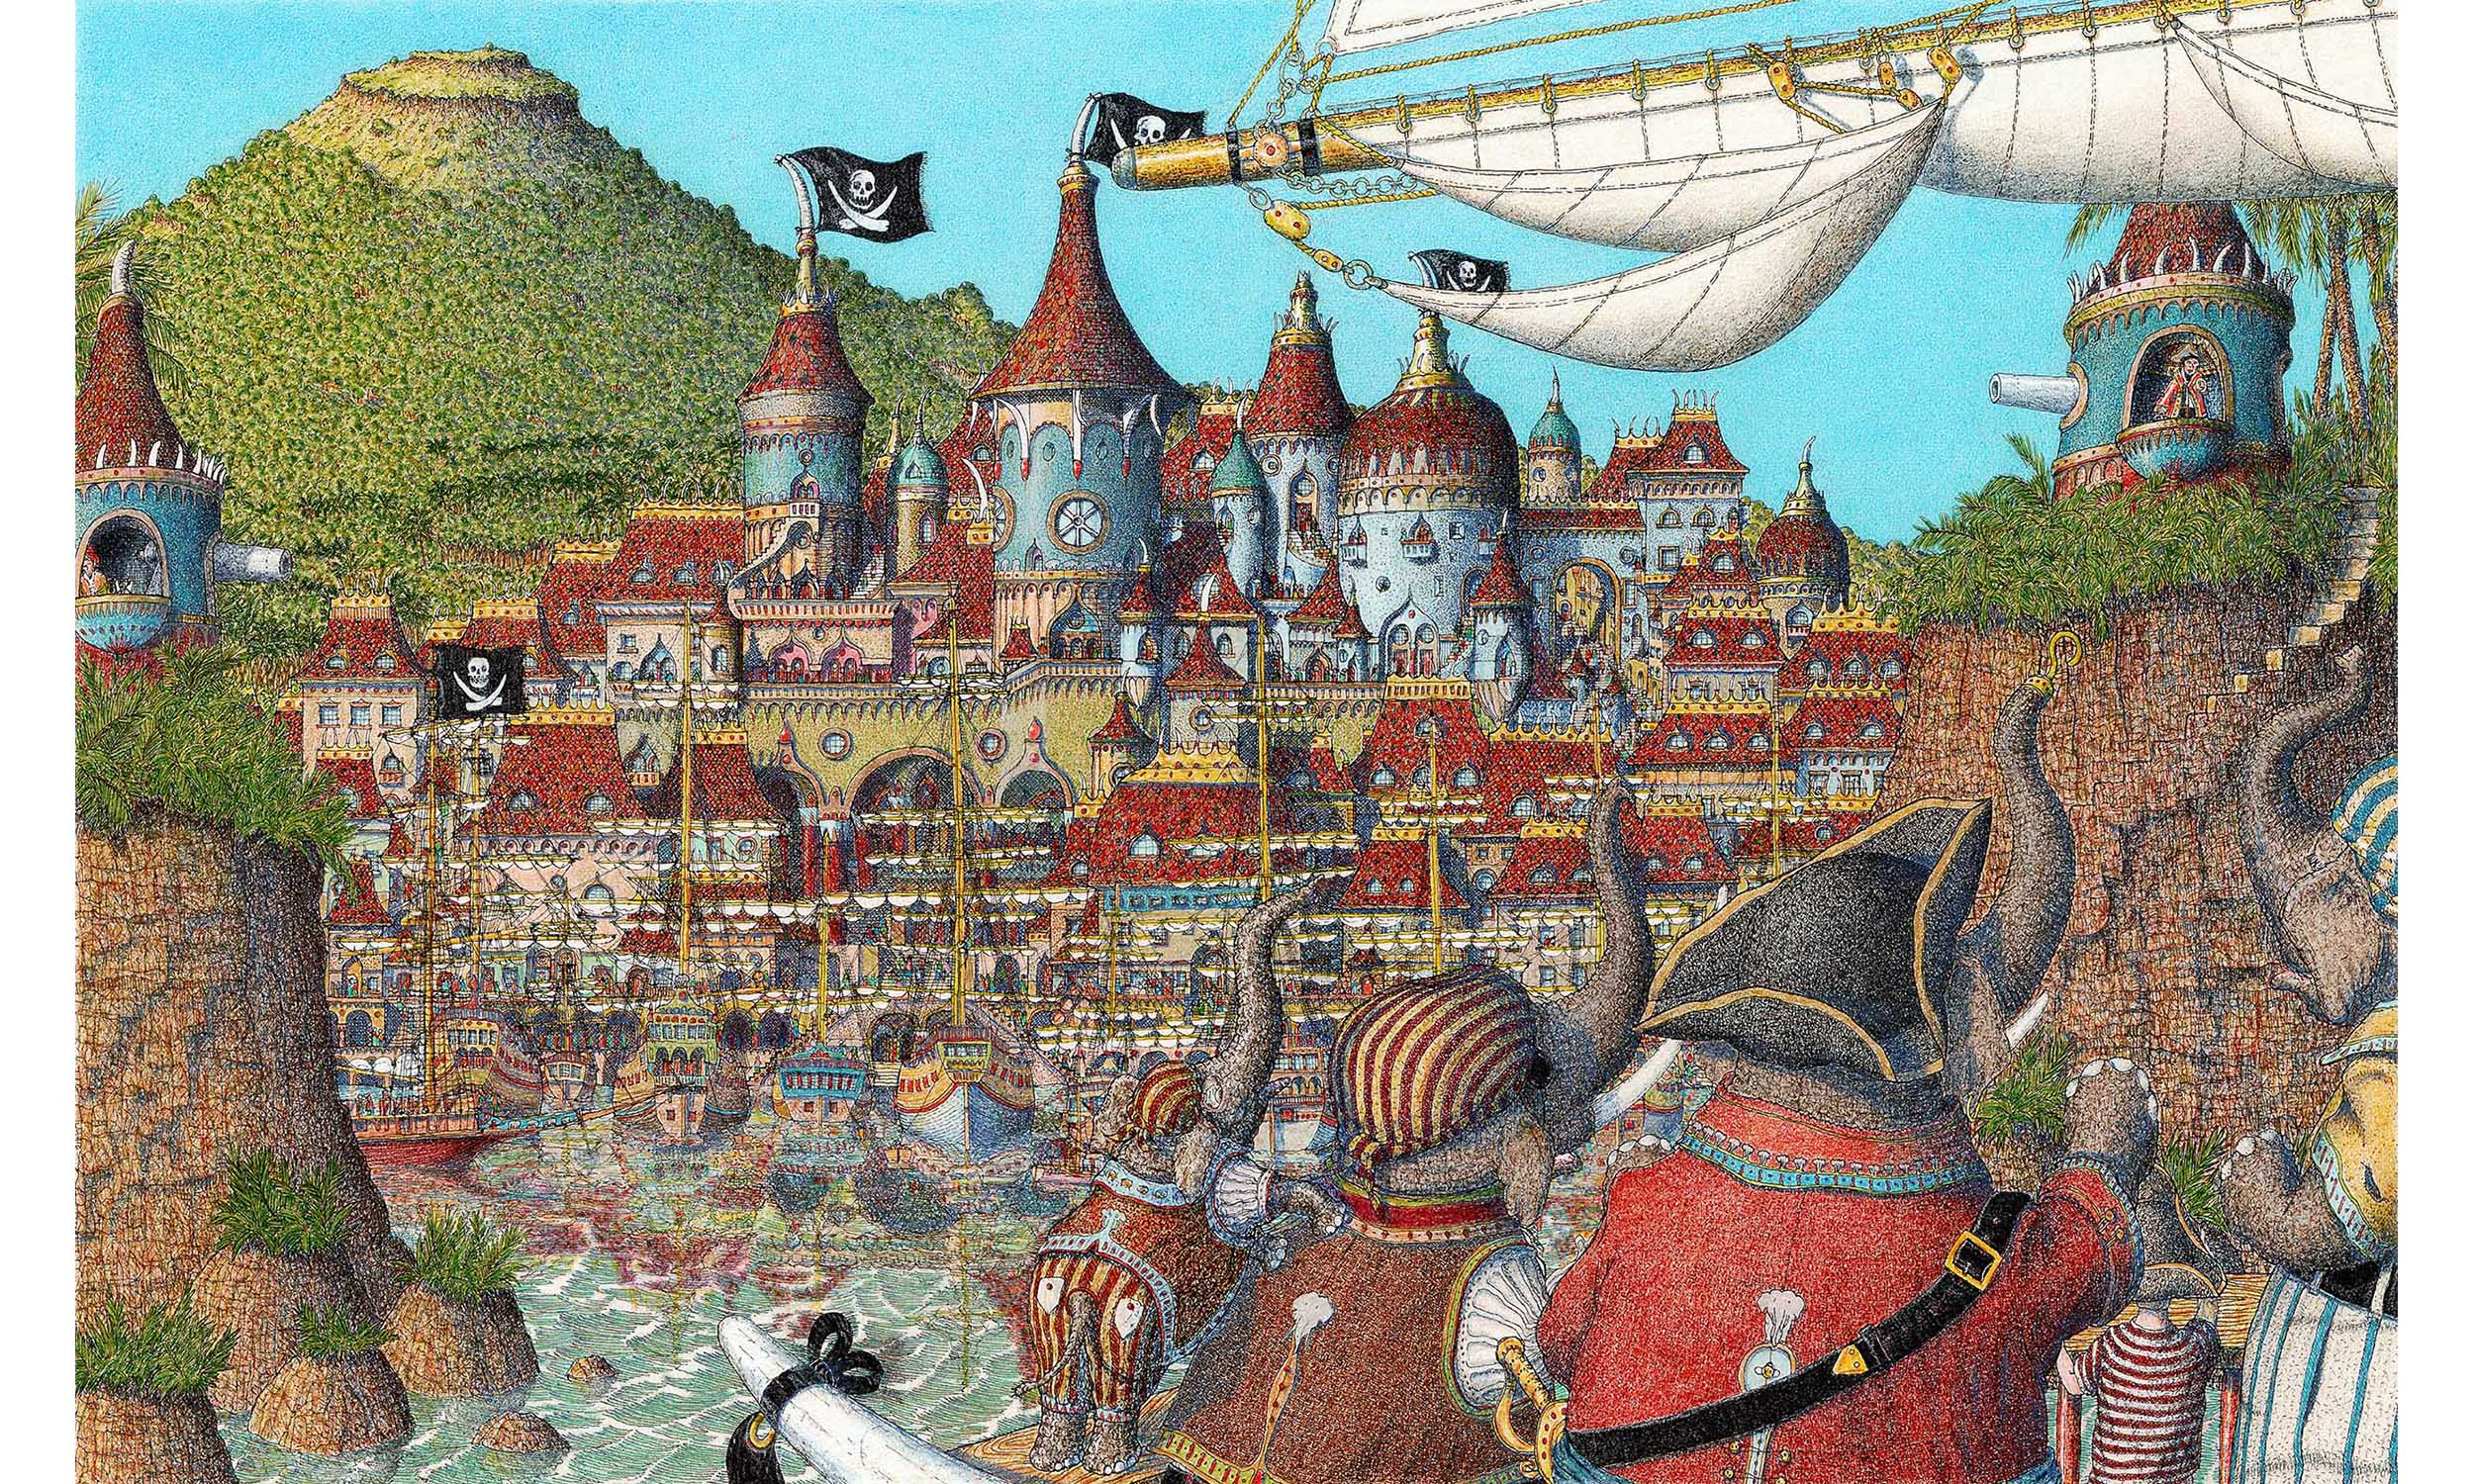 The Pirate City Of Tuskamoro